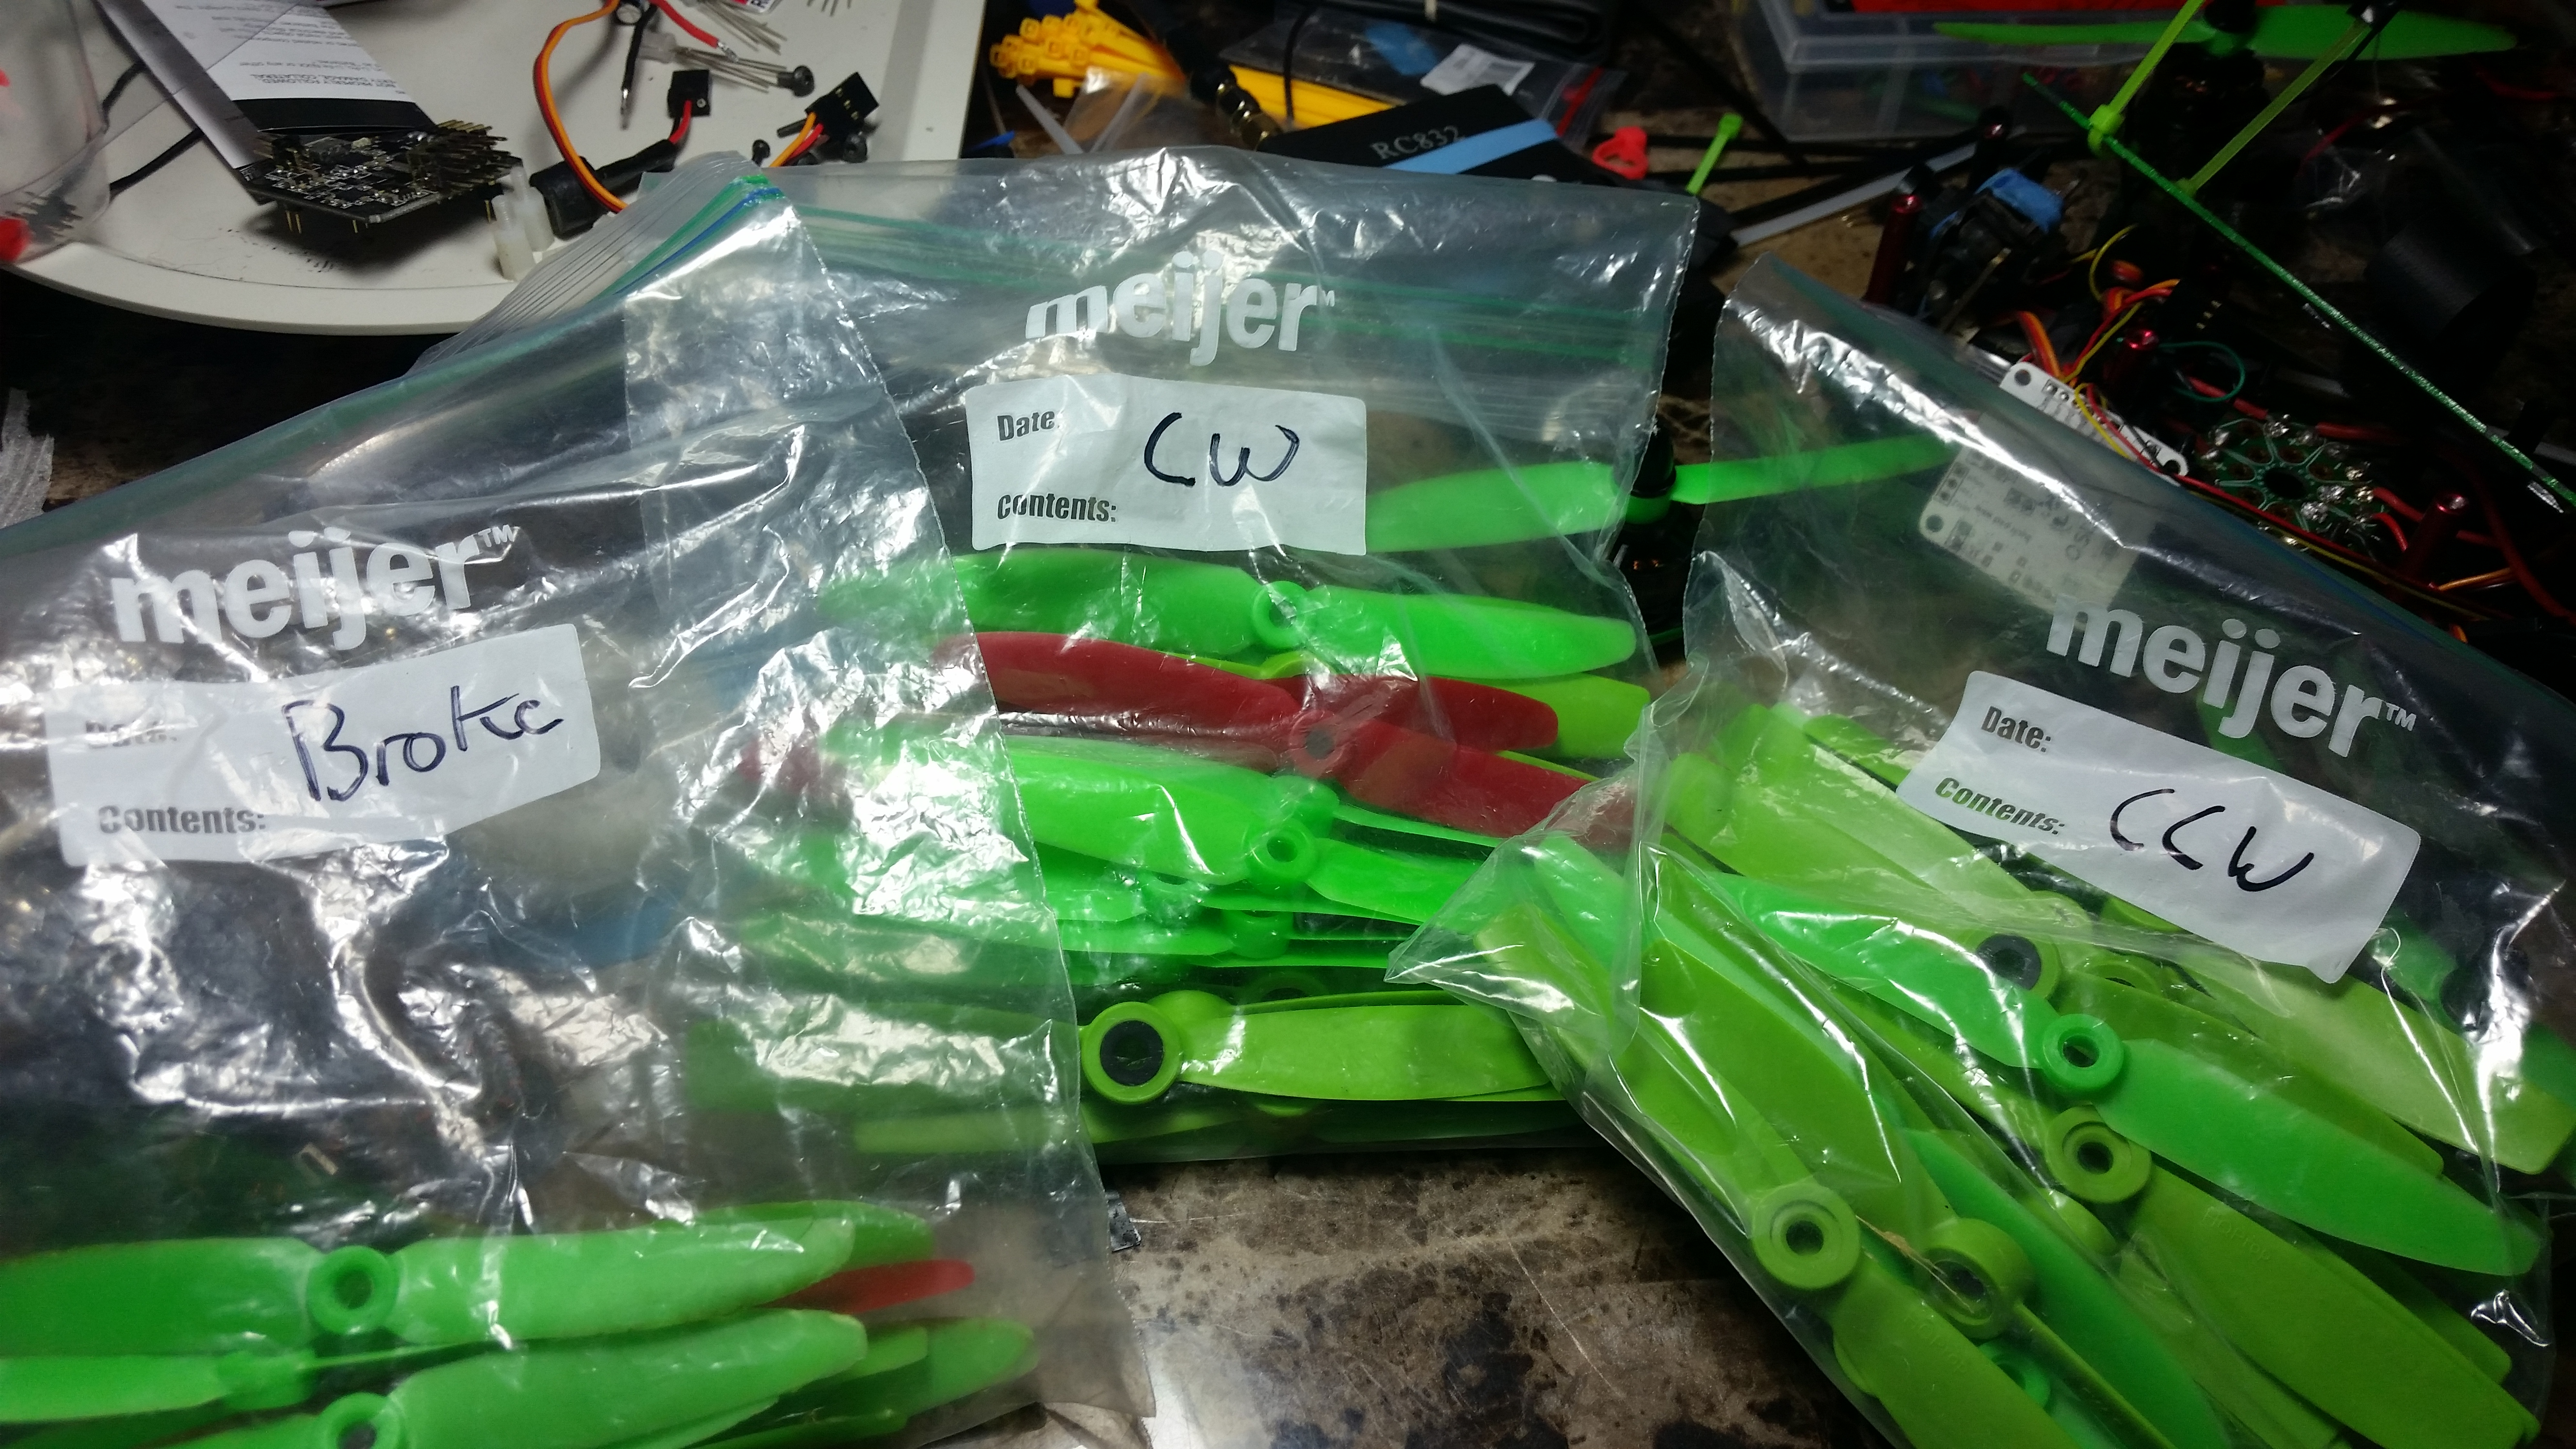 the green machine parts